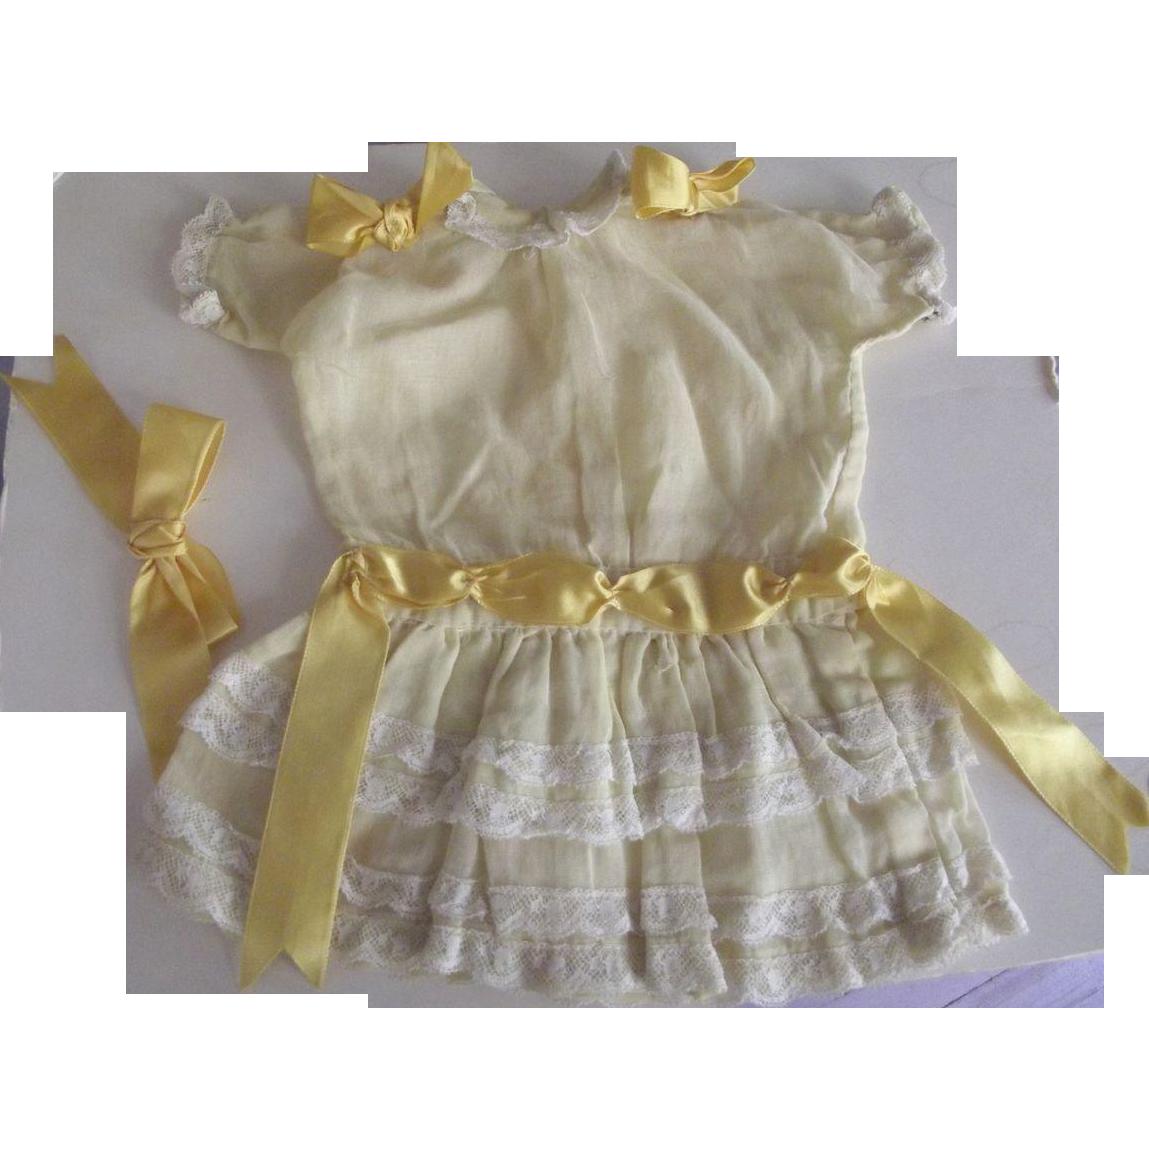 Organza Dress With Yellow Ribbons